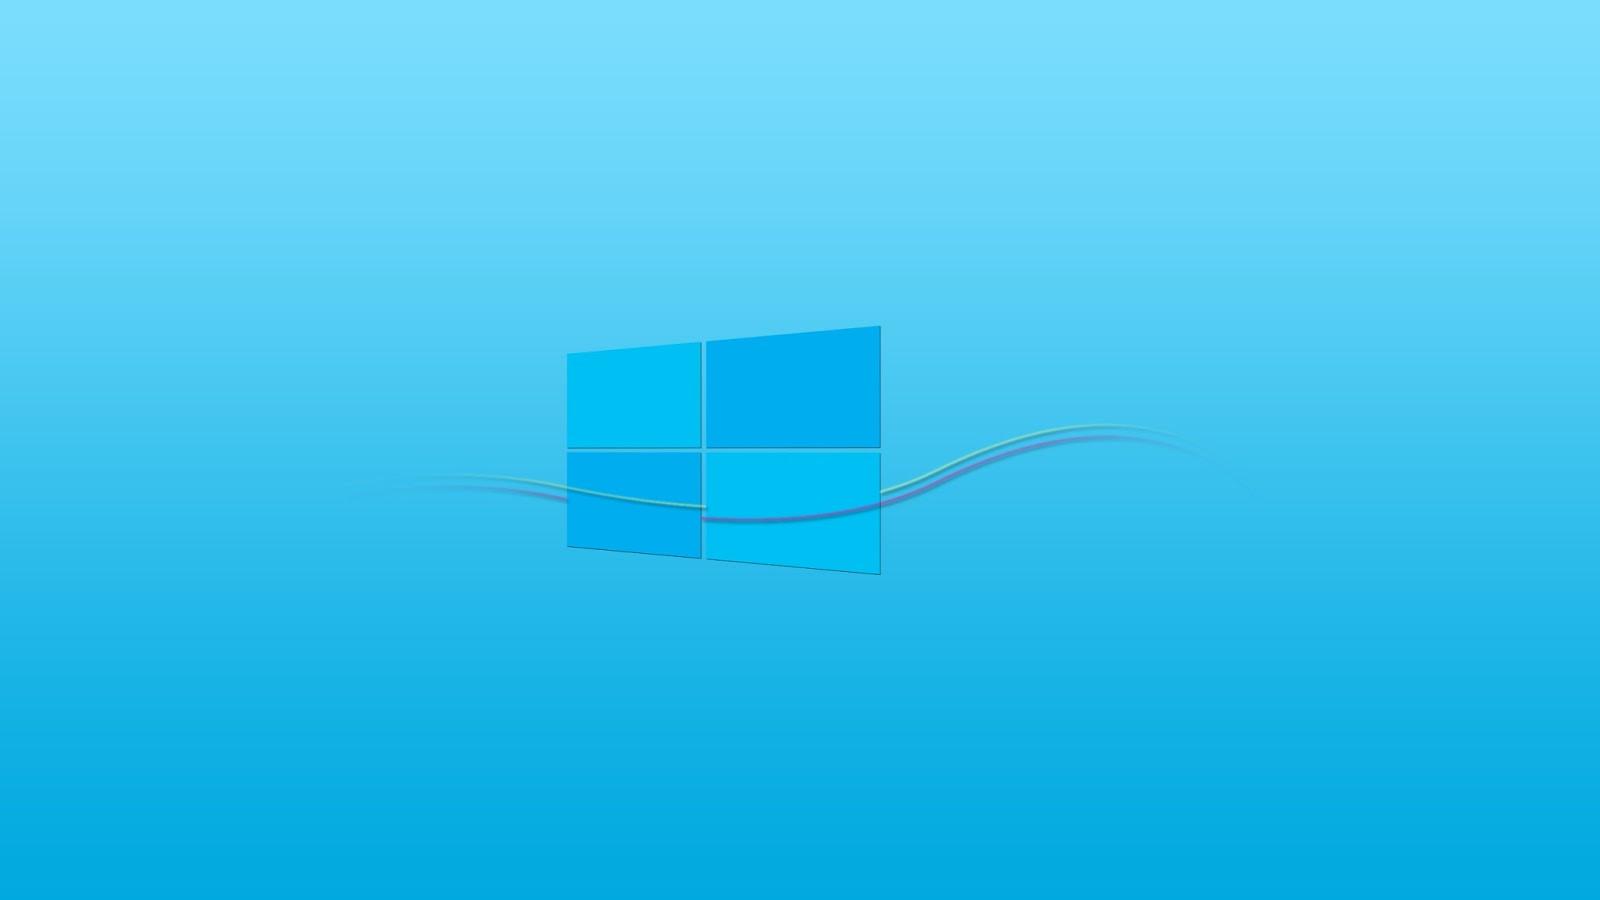 metro-style-blue-theme-windows-8-professional-neat-plain-wallpaper-download.jpg